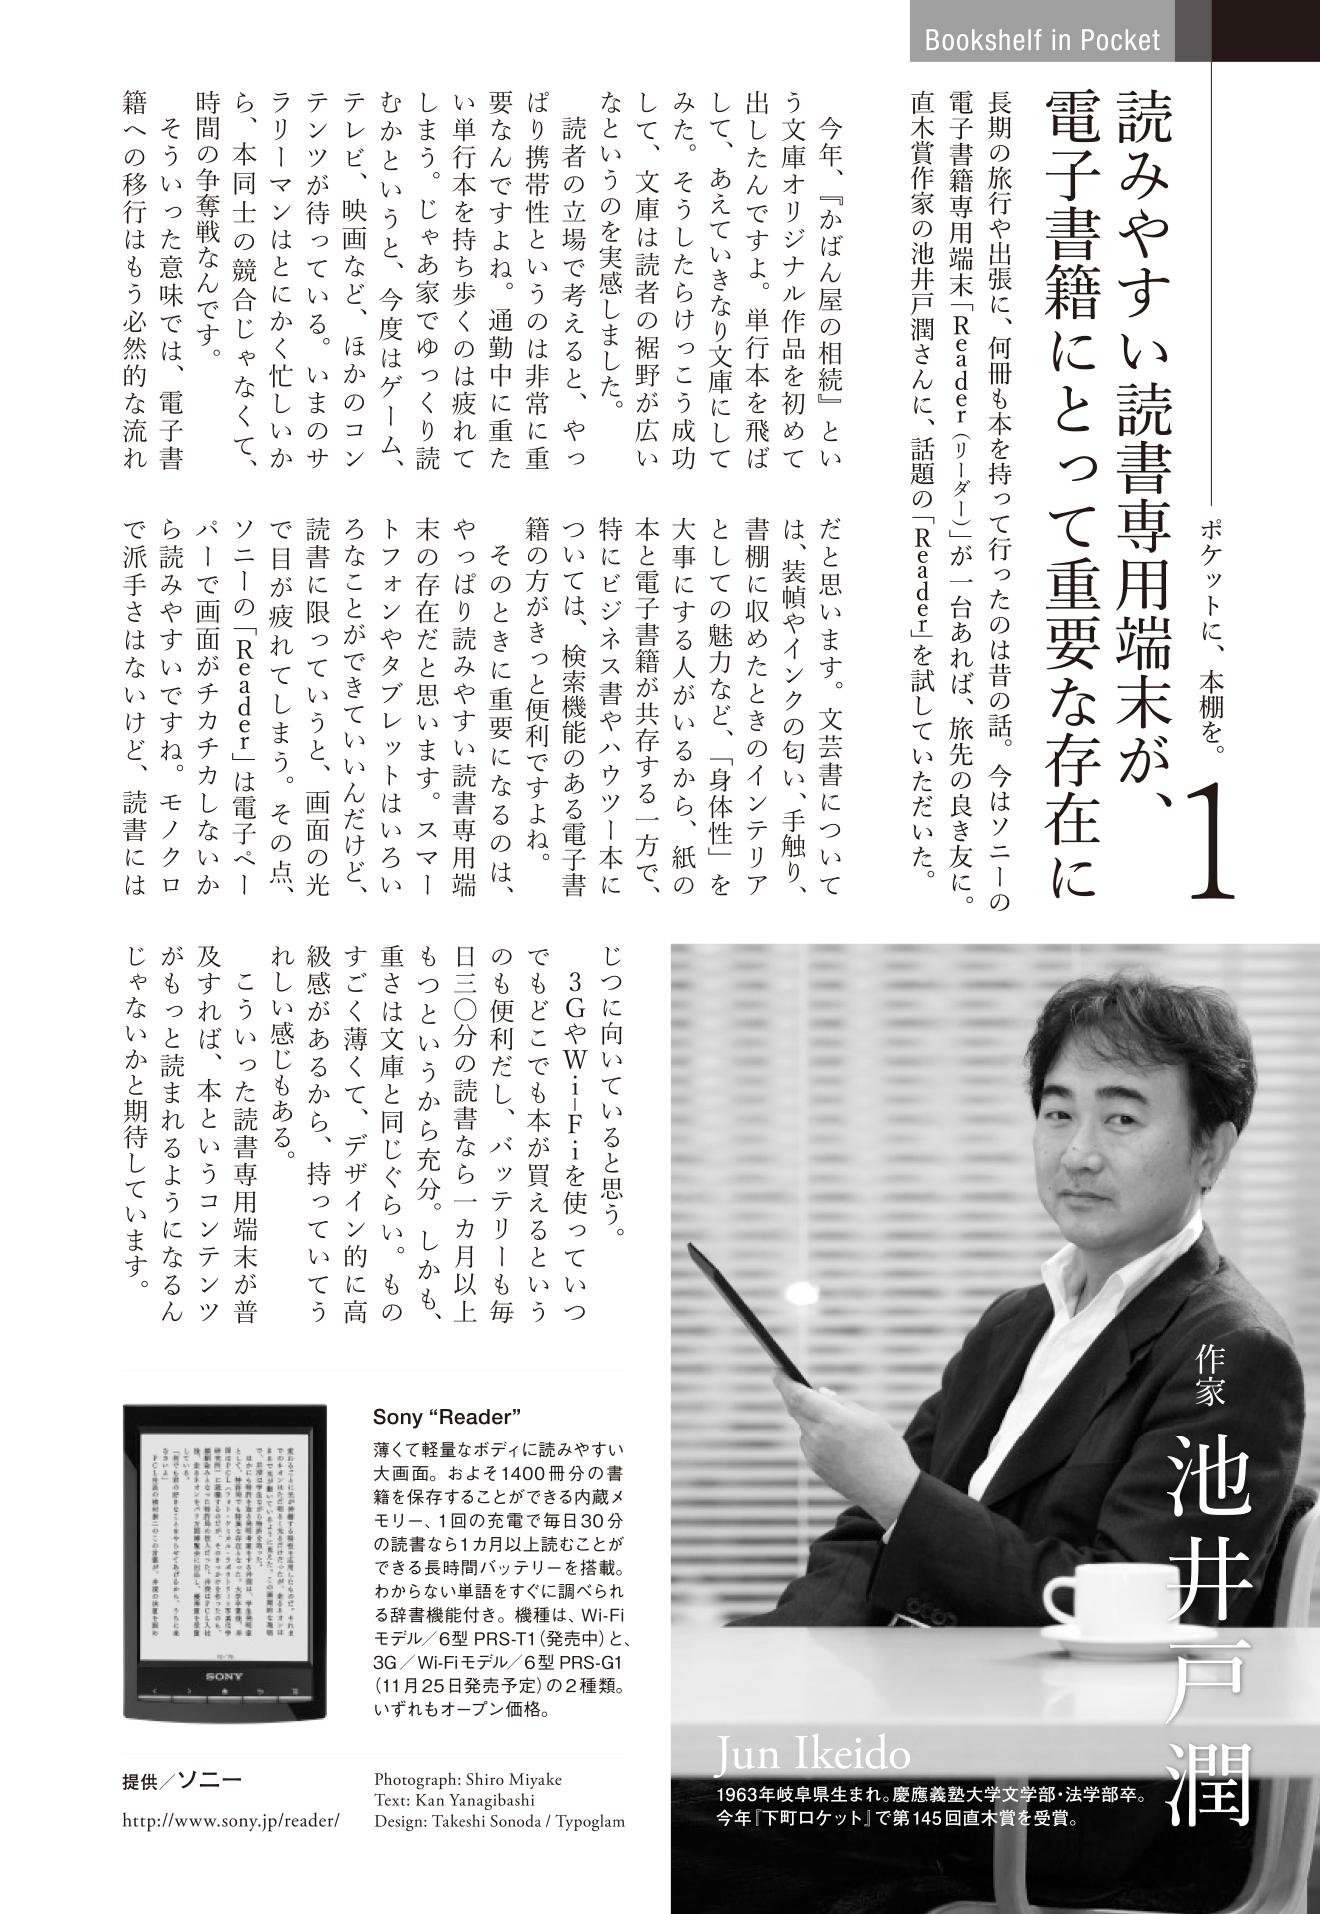 月刊文春×Sony Reader TU広告